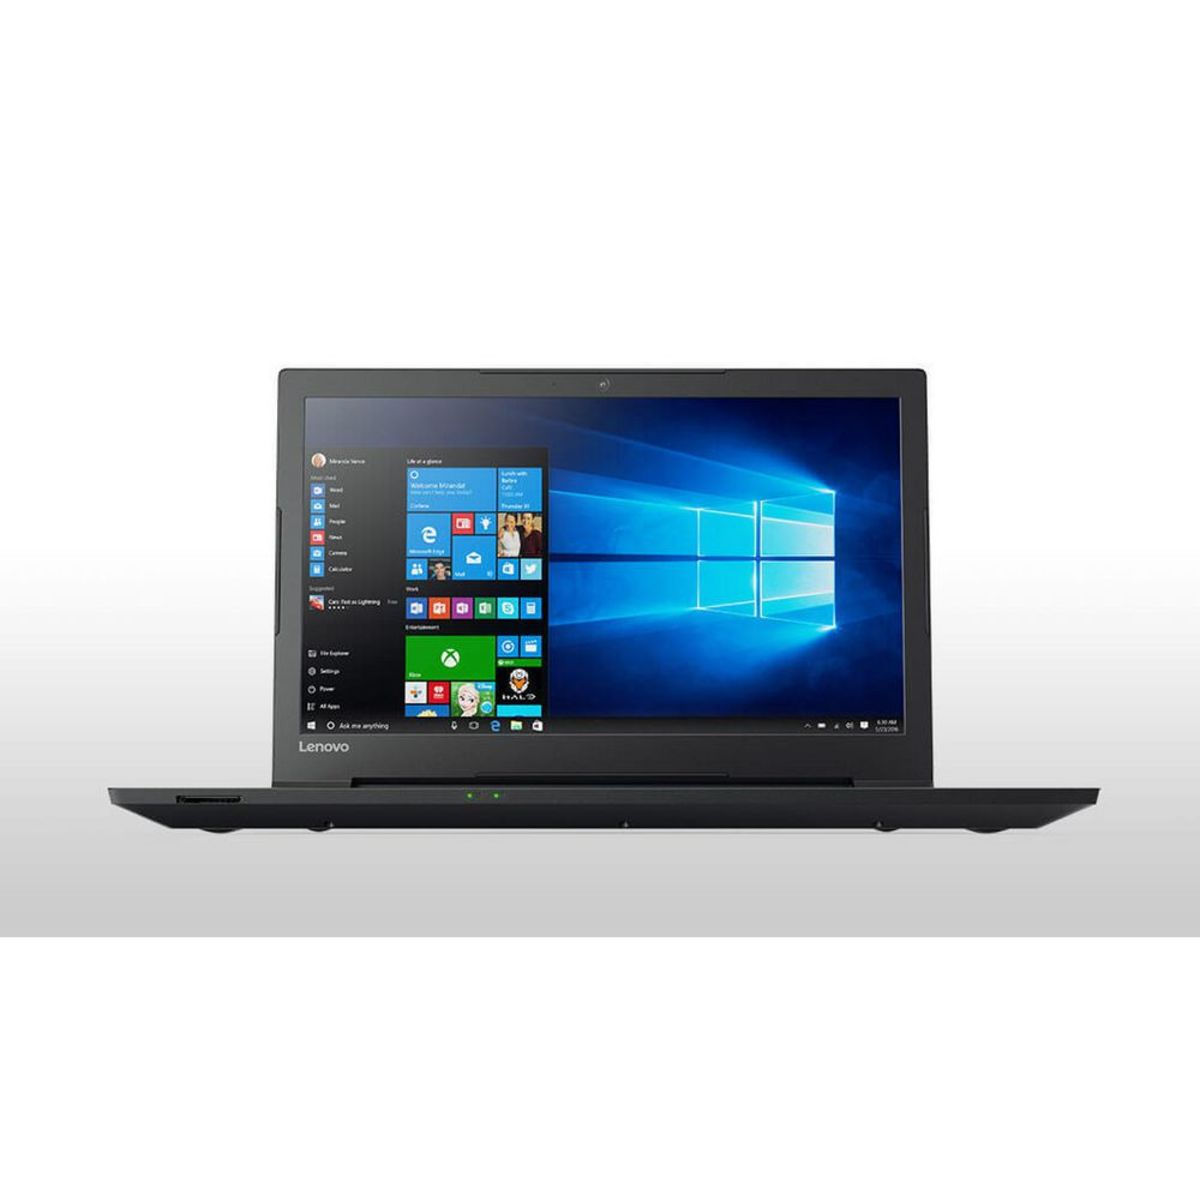 Bild 4 von Lenovo V110-15IAP, Notebook, 8GB RAM, 128GB SSD, Win 10